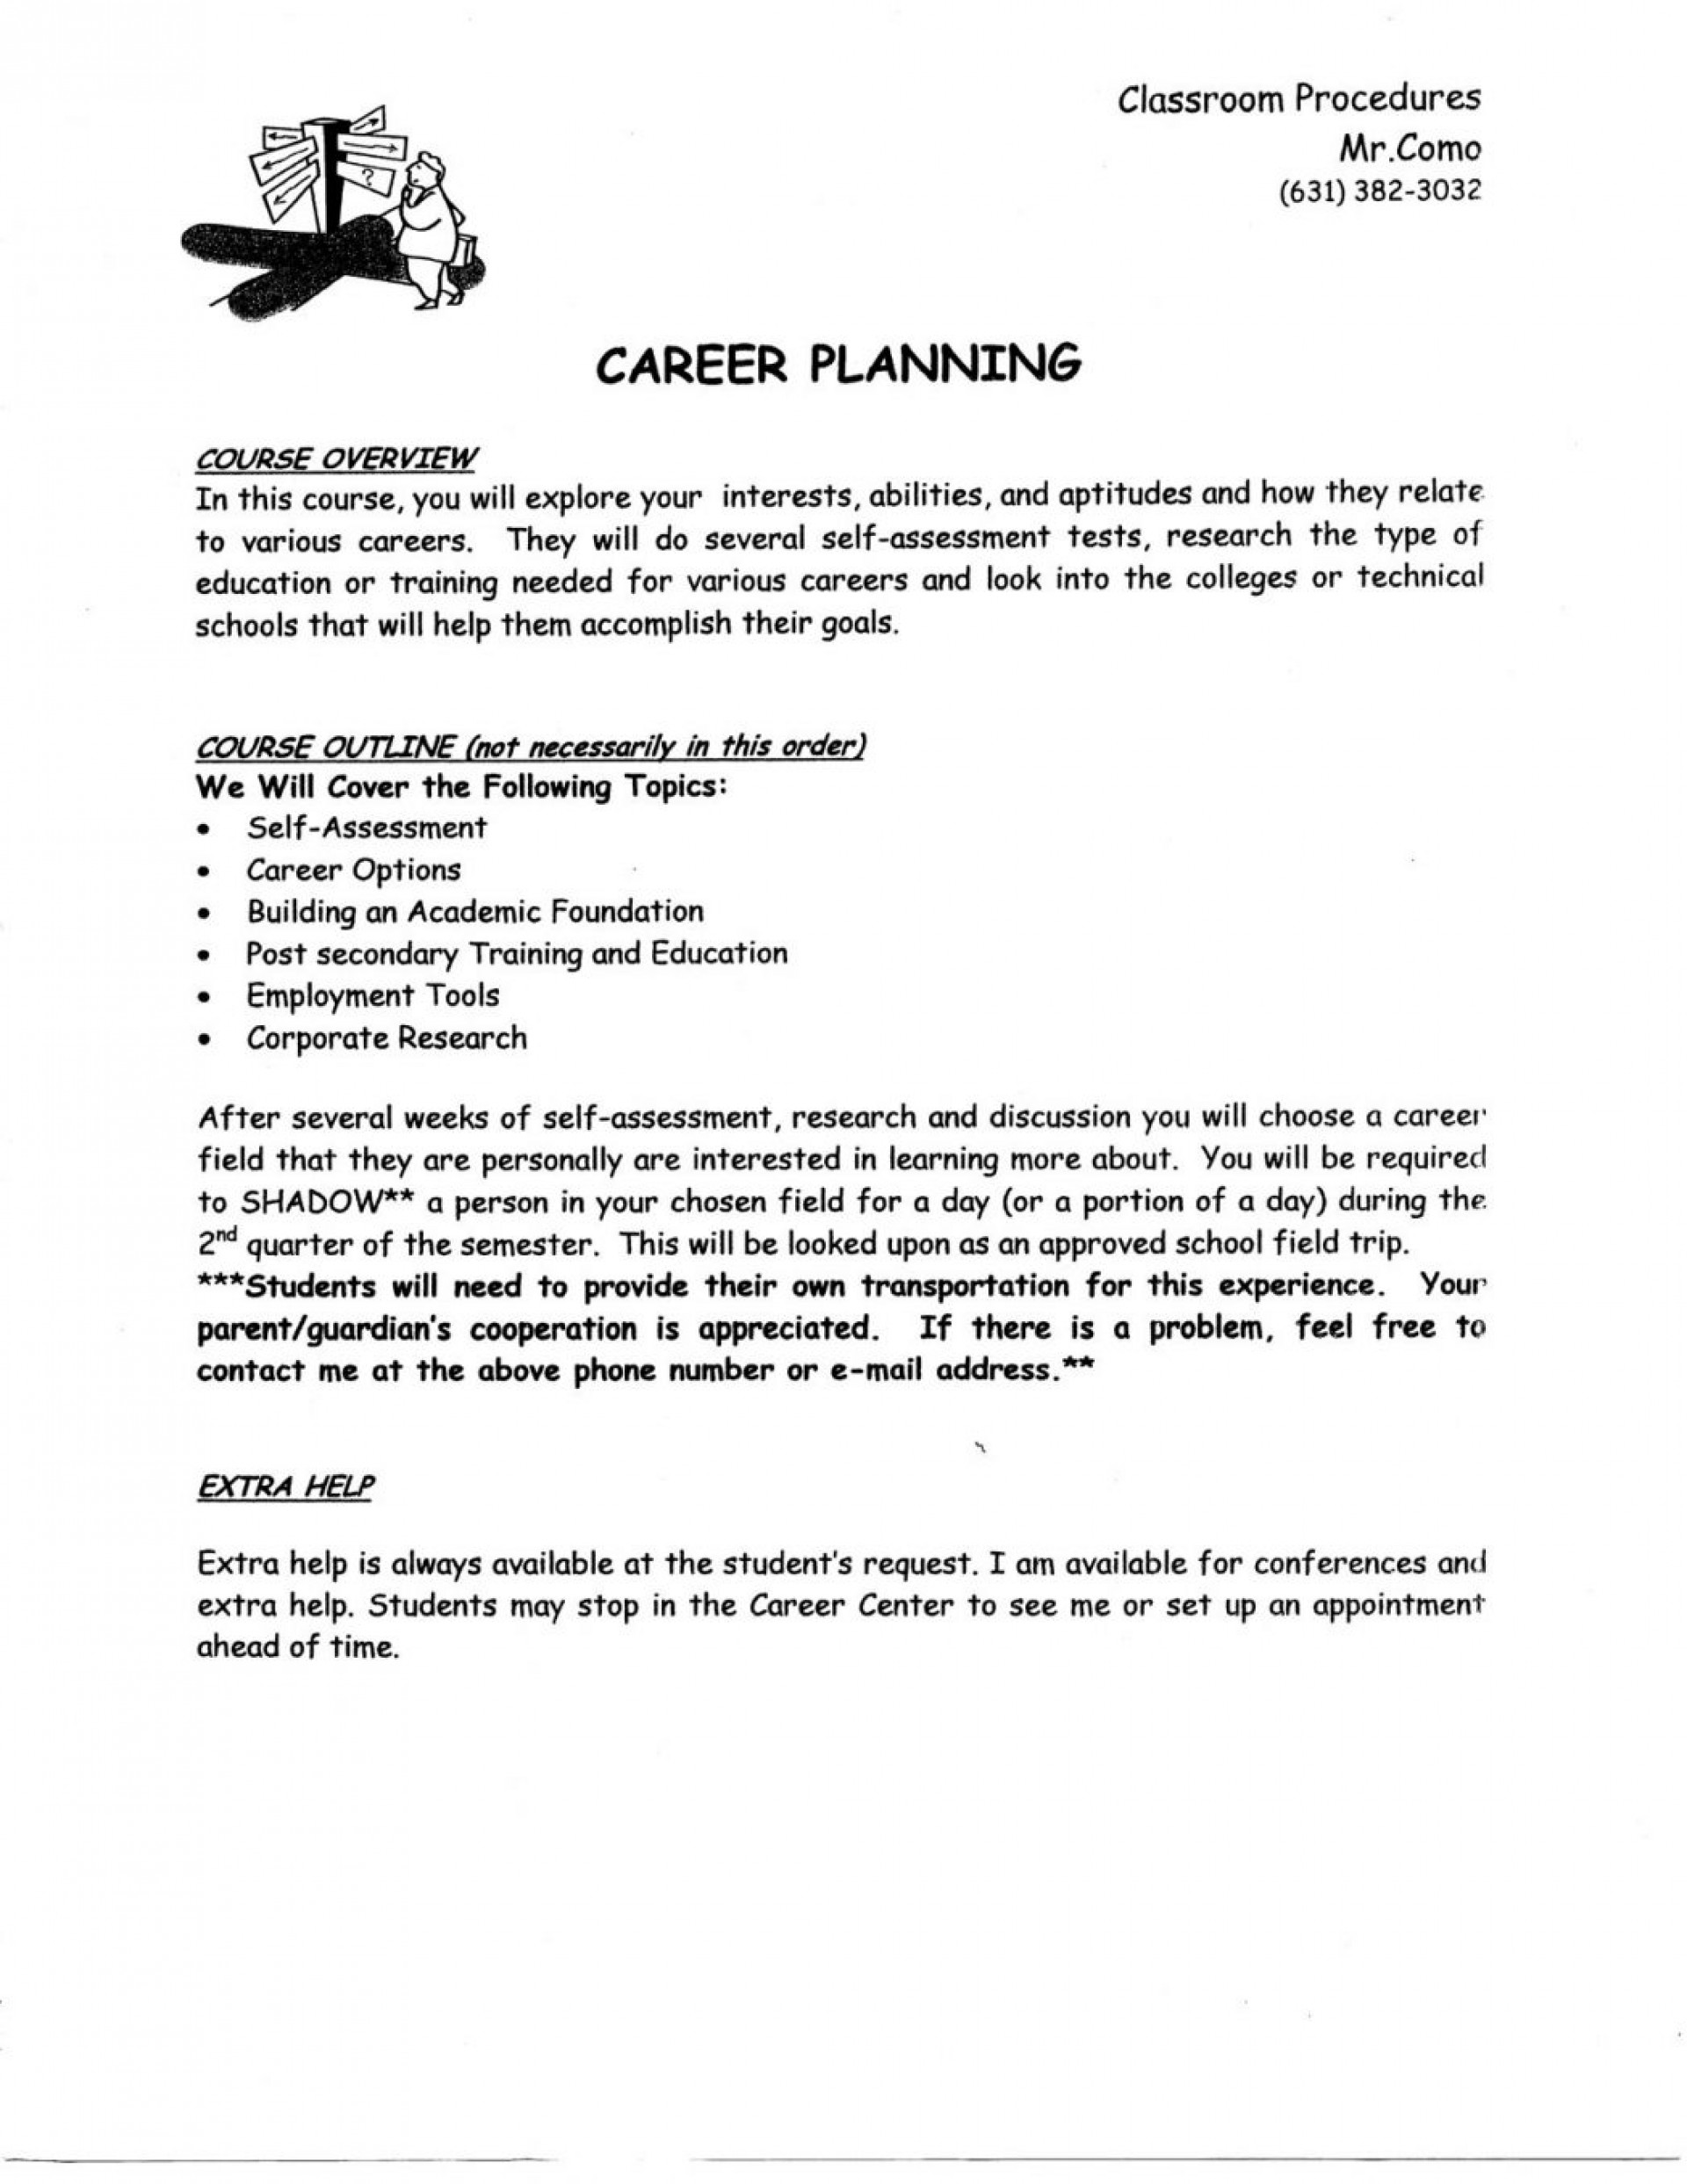 006 Essay Example Career Plan Plans Template Planni Outline Development Goal Exploration Nursing Research Astounding For